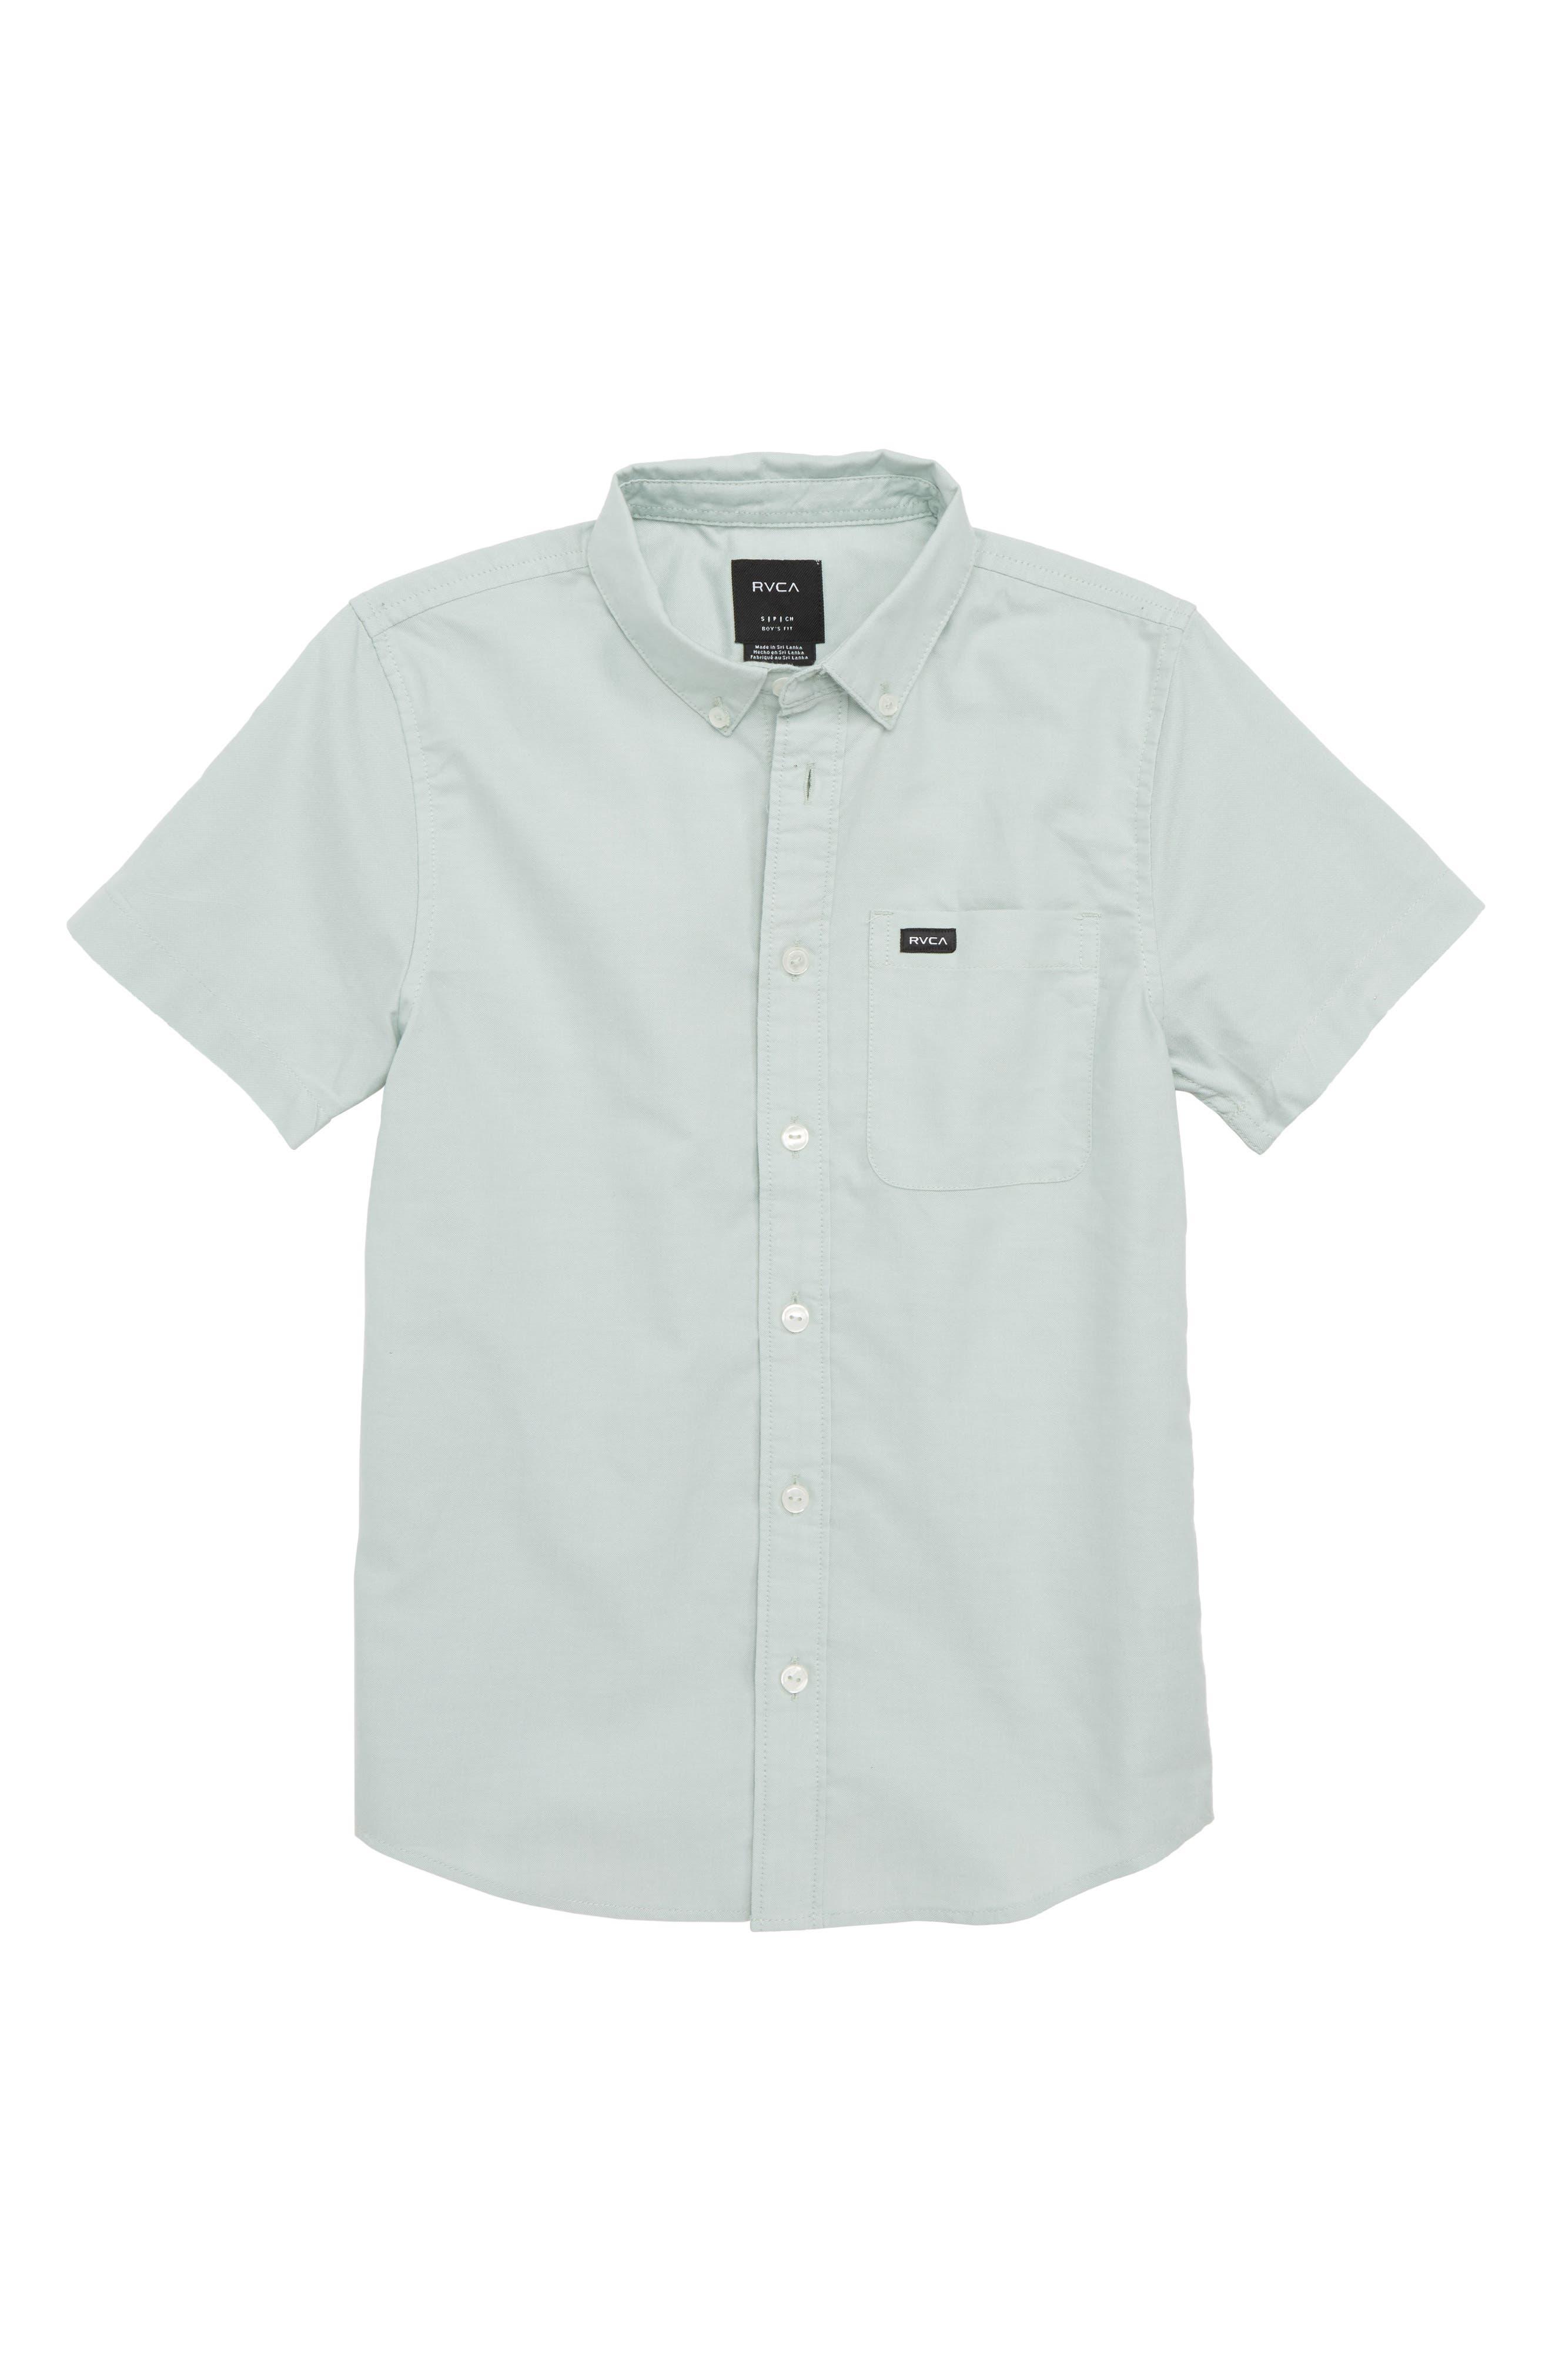 'That'll Do' Woven Shirt,                             Main thumbnail 3, color,